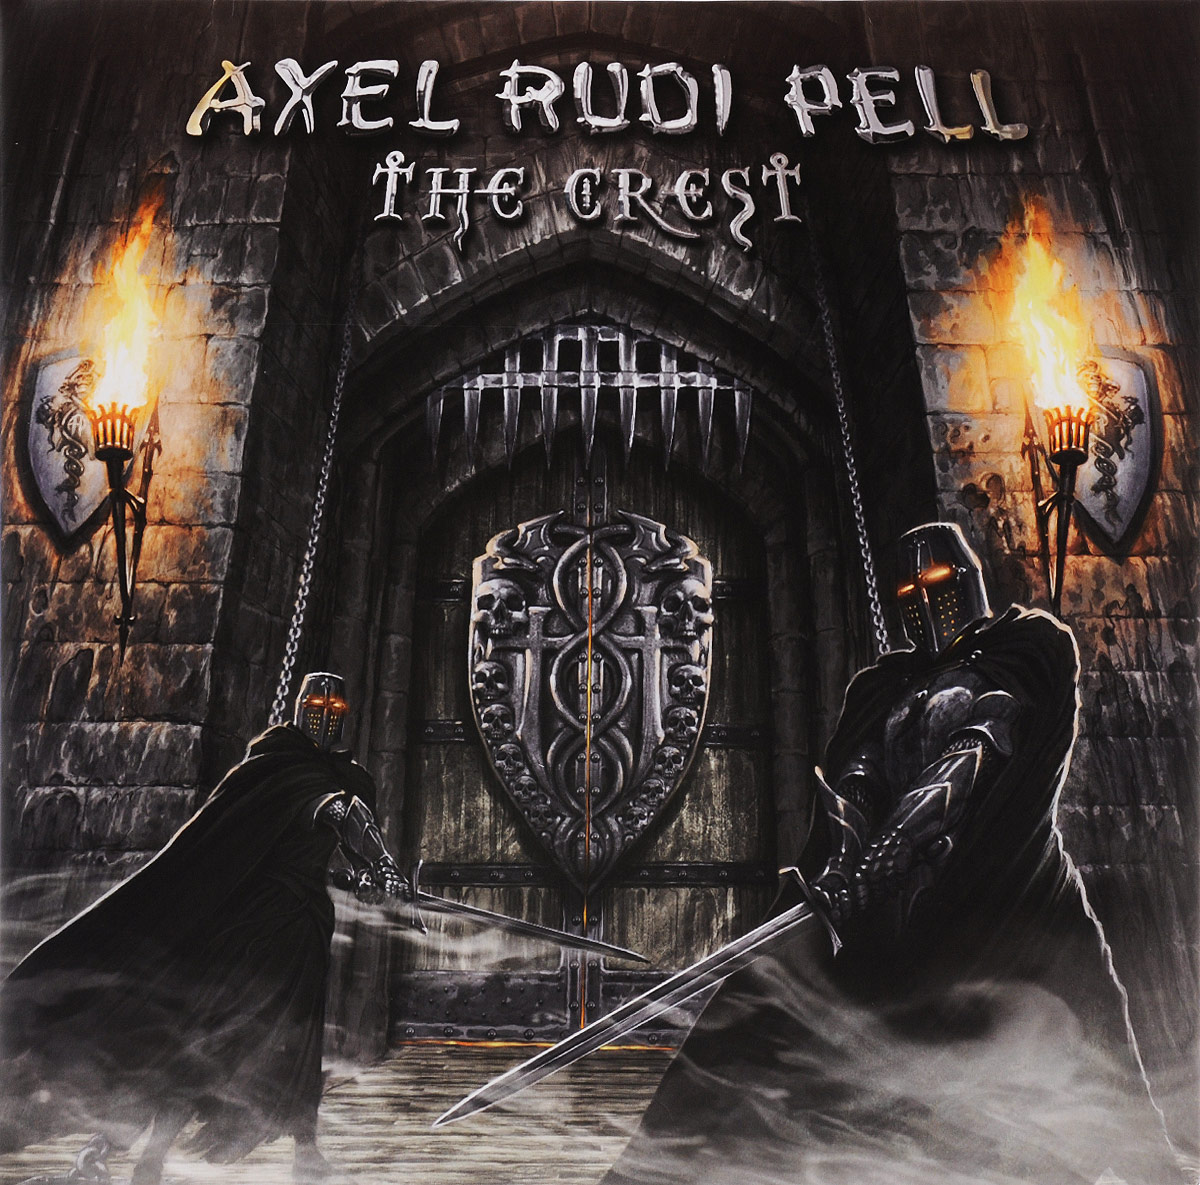 Аксель Руди Пелл Axel Rudi Pell. The Crest (2 LP) аксель руди пелл axel rudi pell the wizards chosen few 2 cd